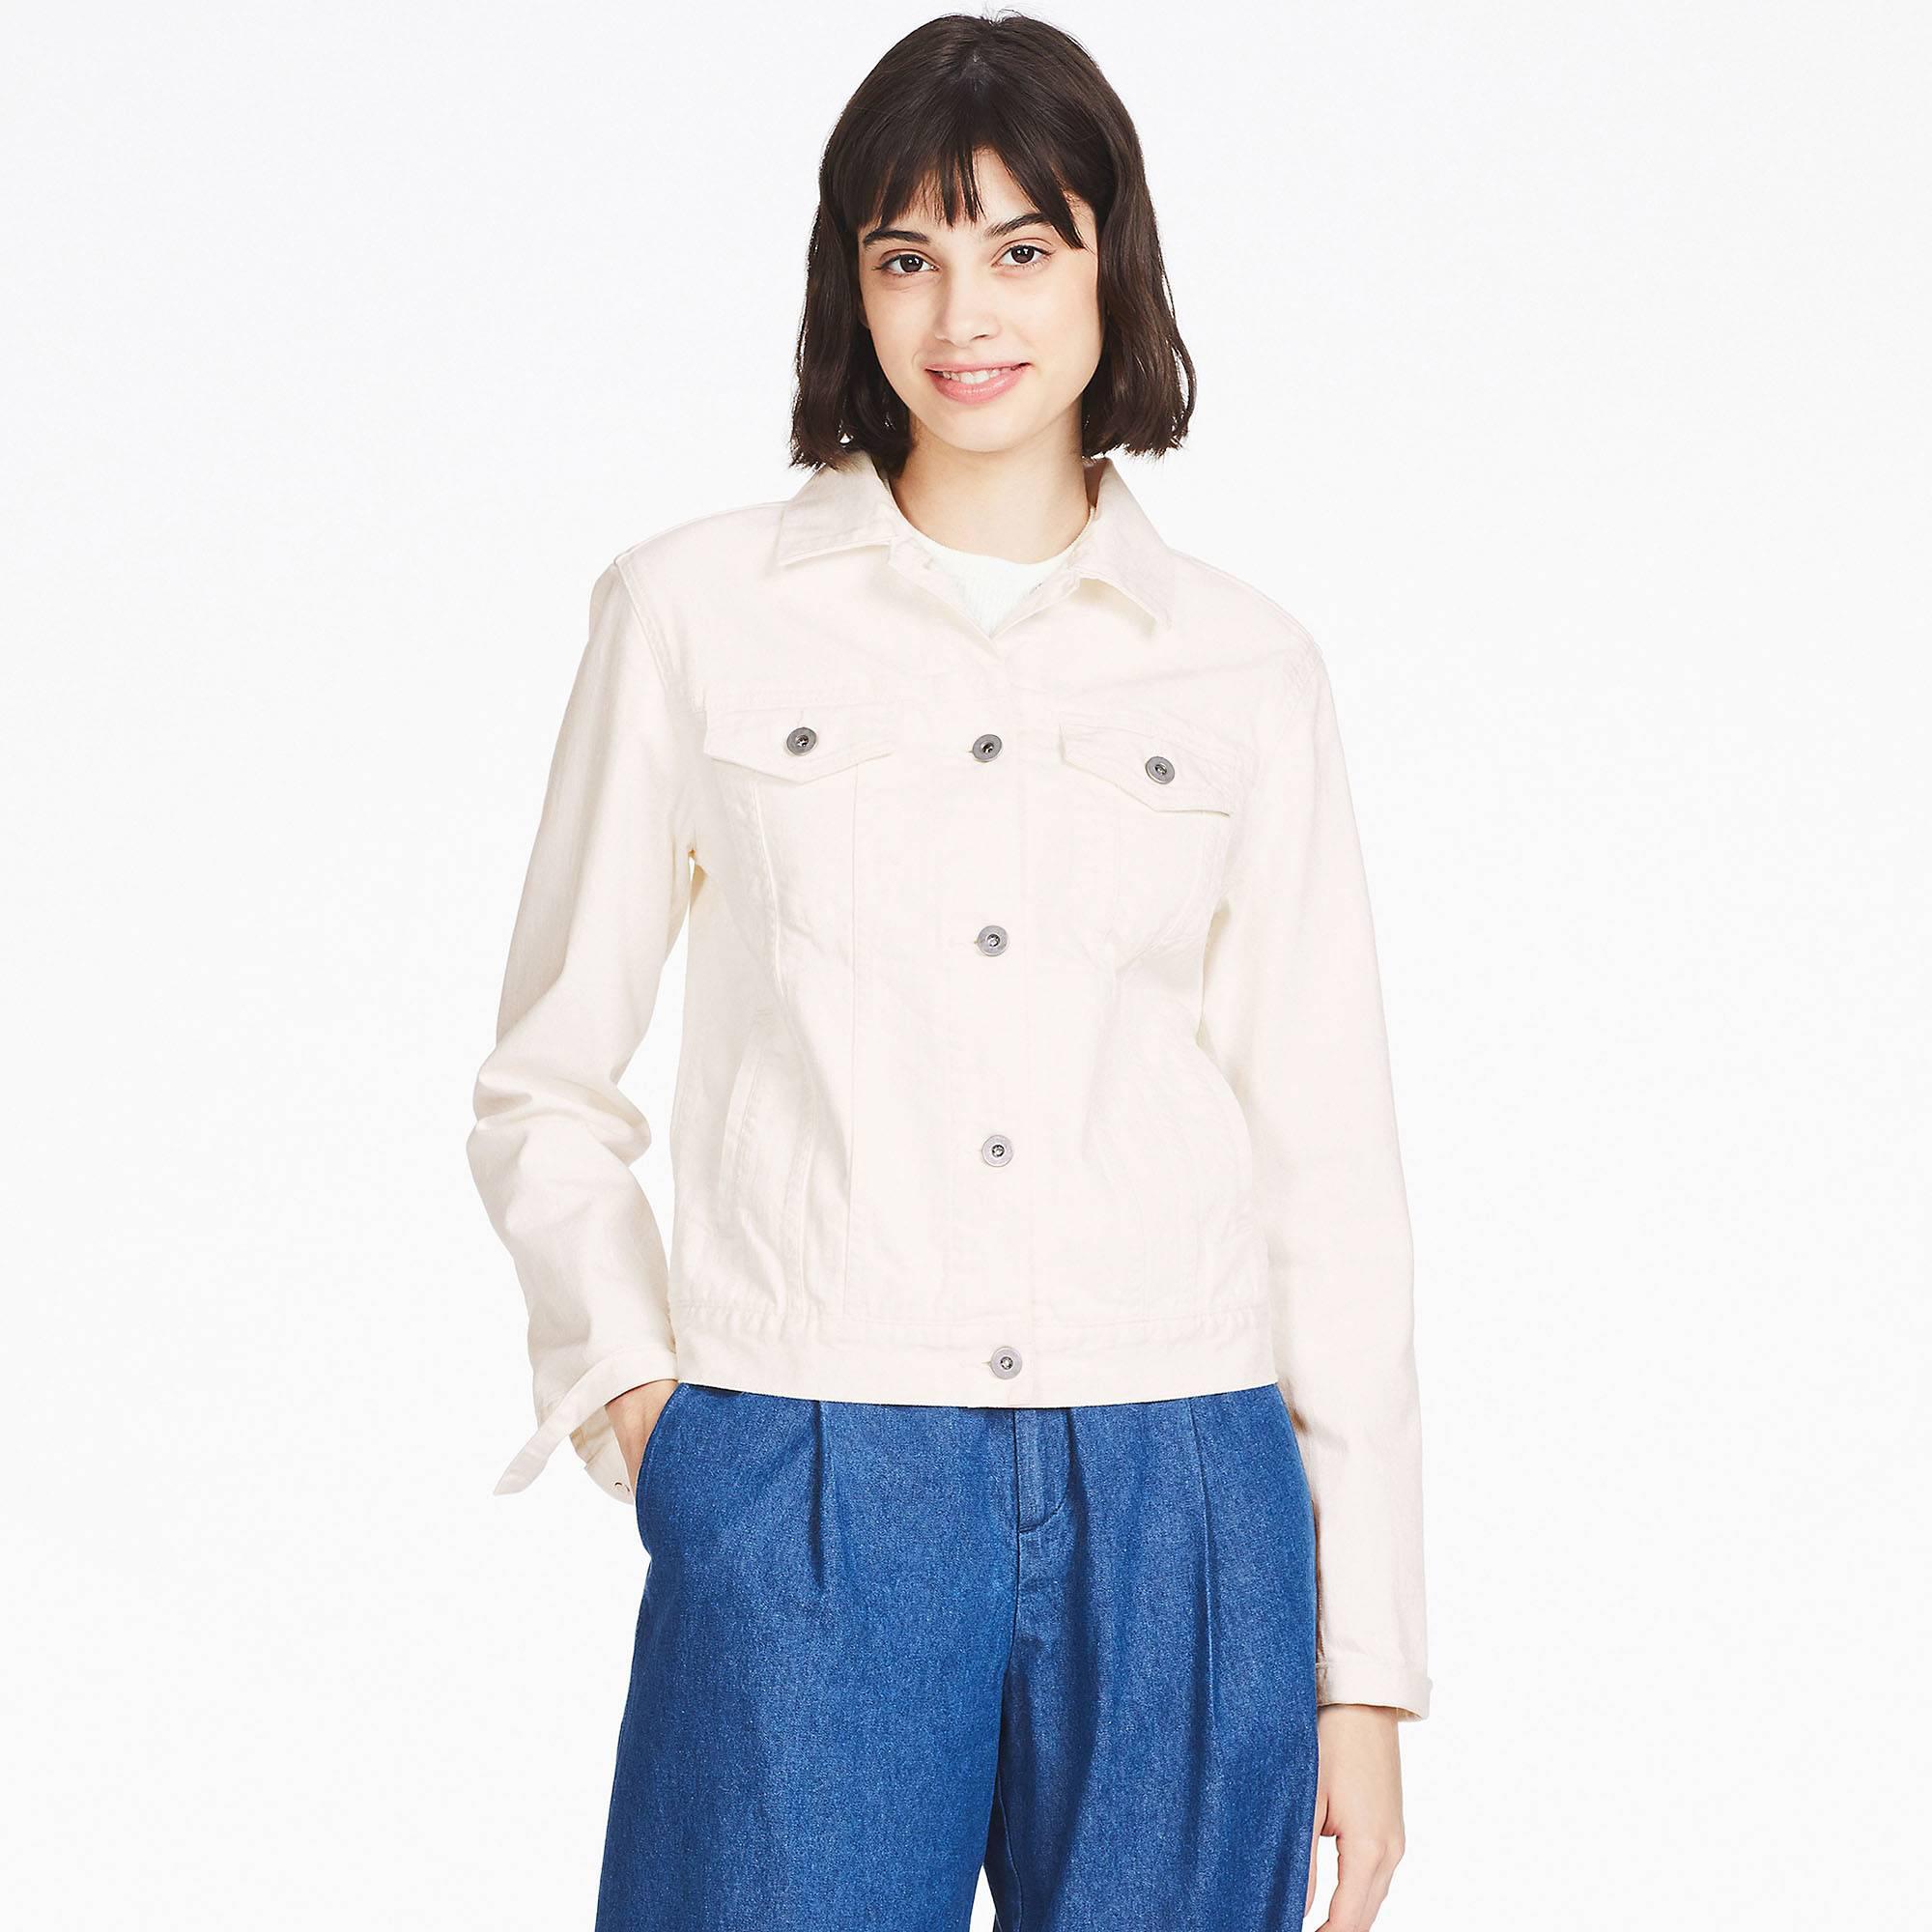 Lyst Uniqlo Women Denim Jacket In White